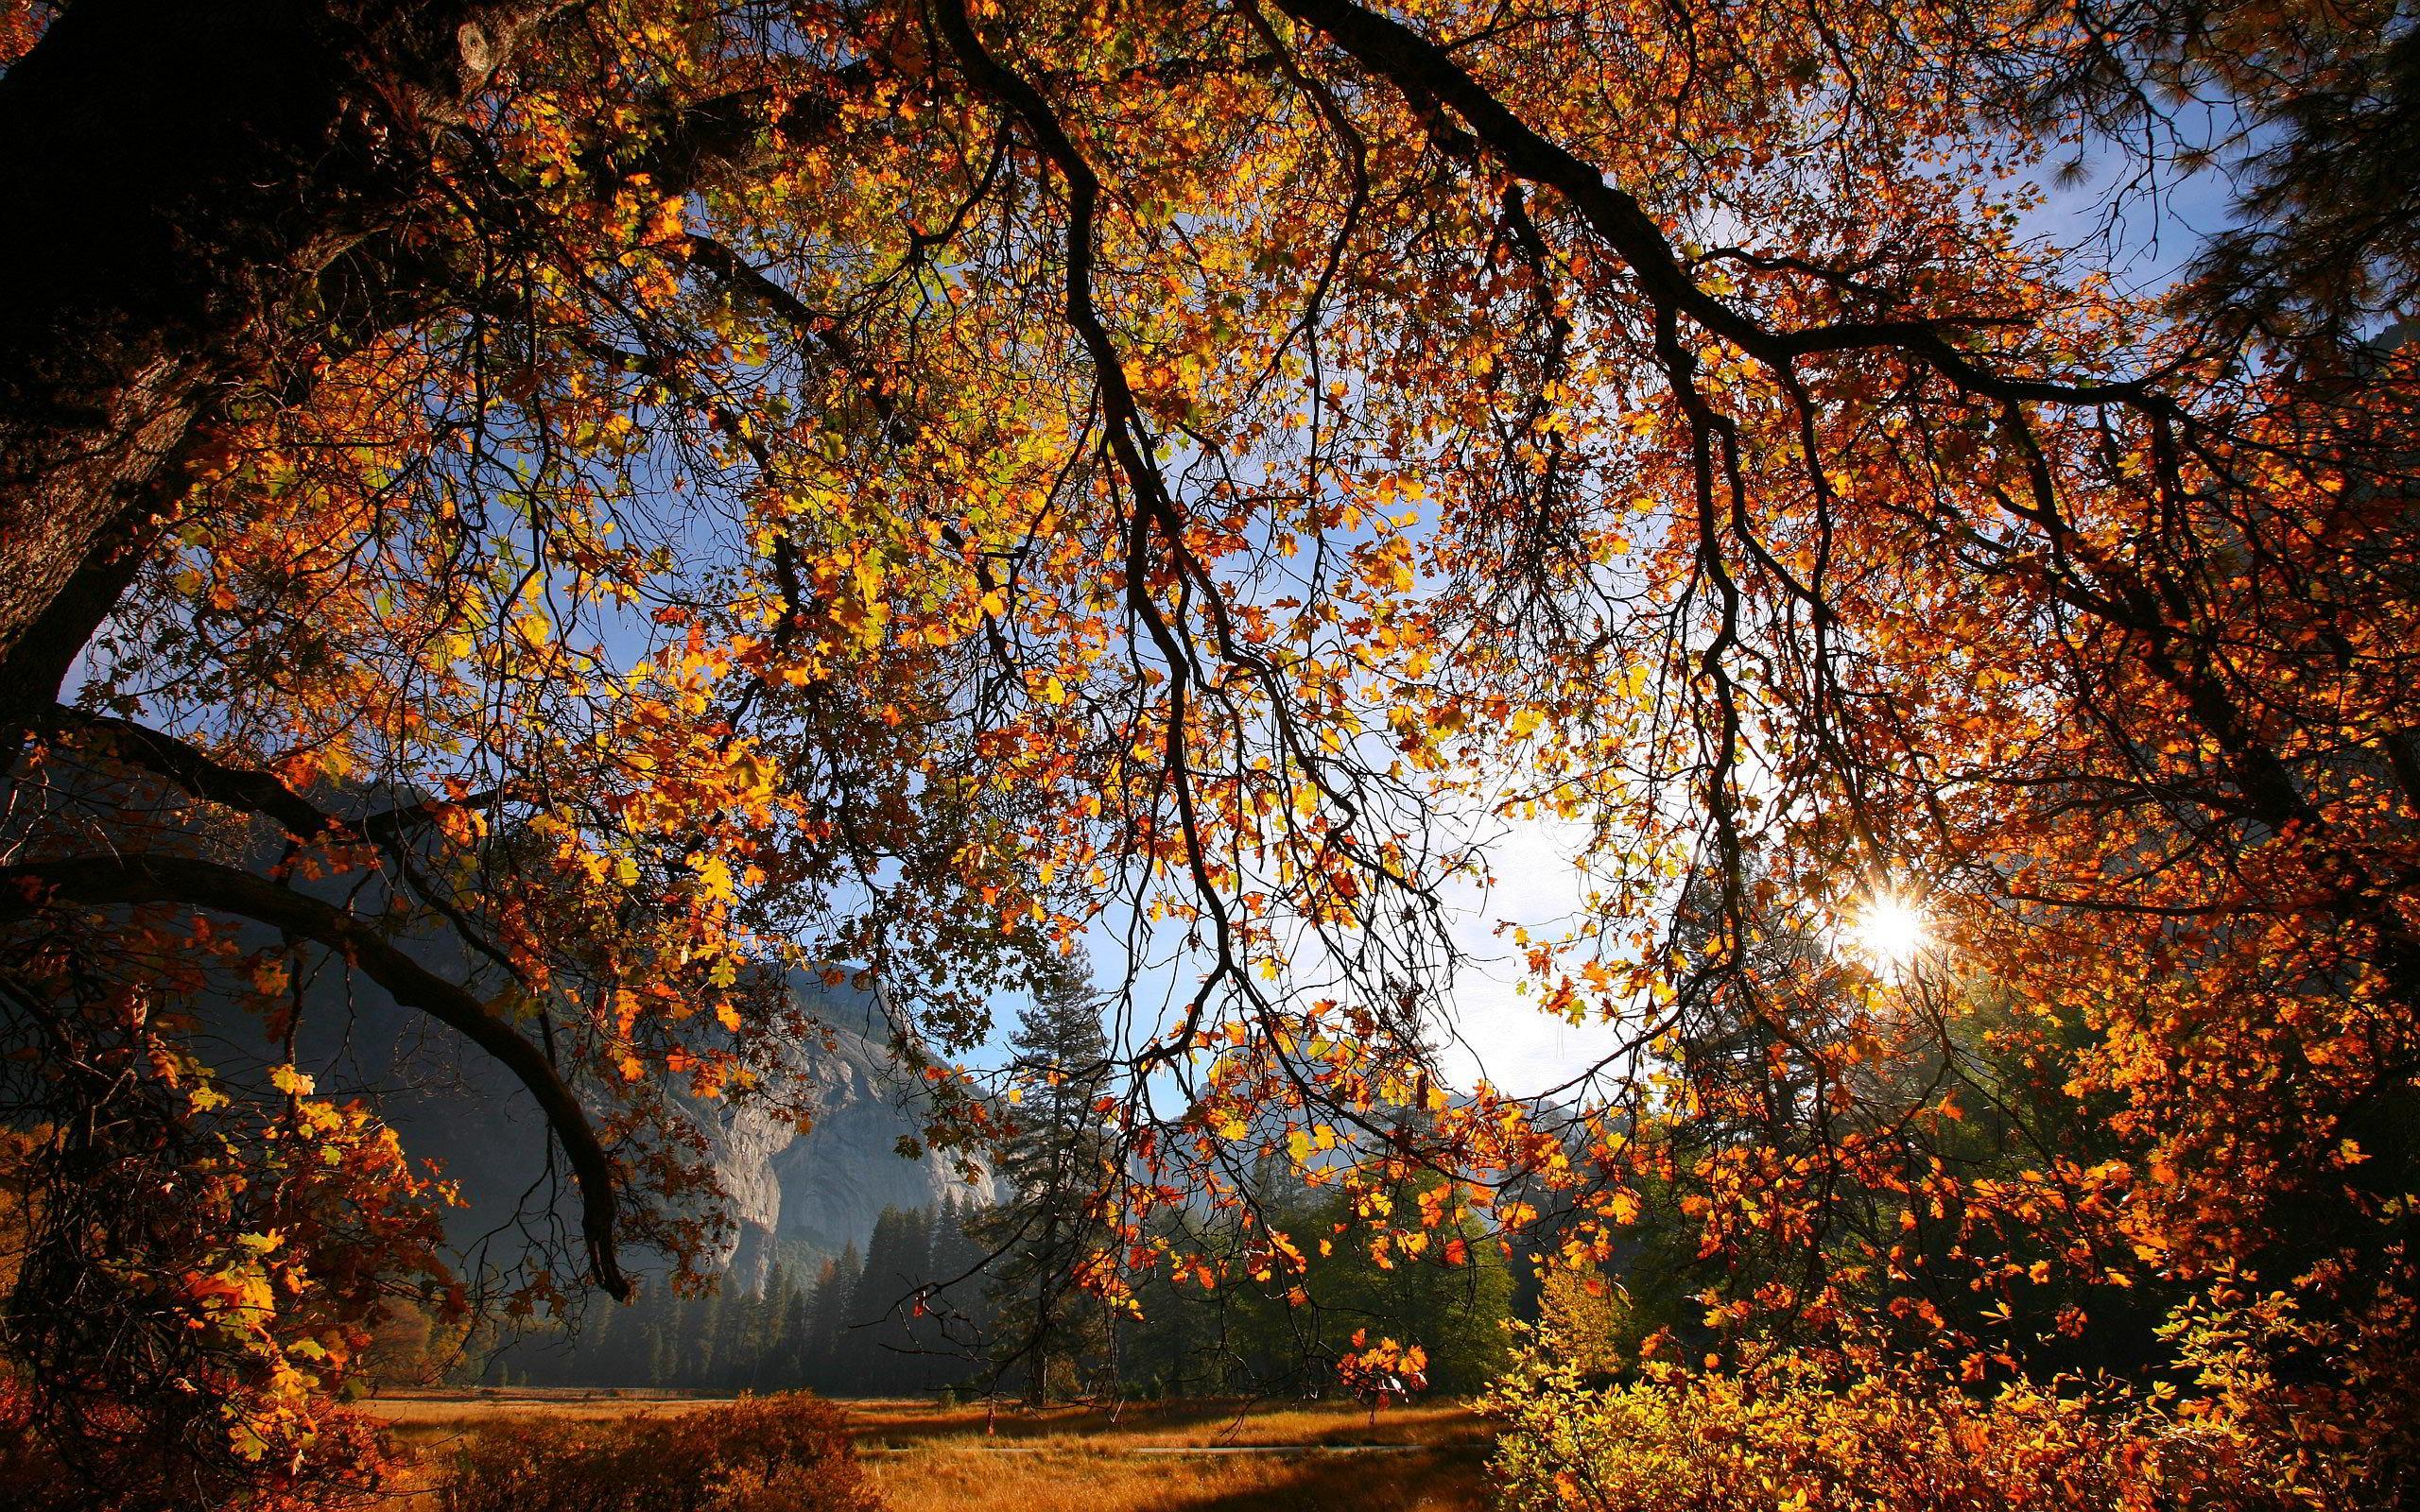 autumn sunset pictures